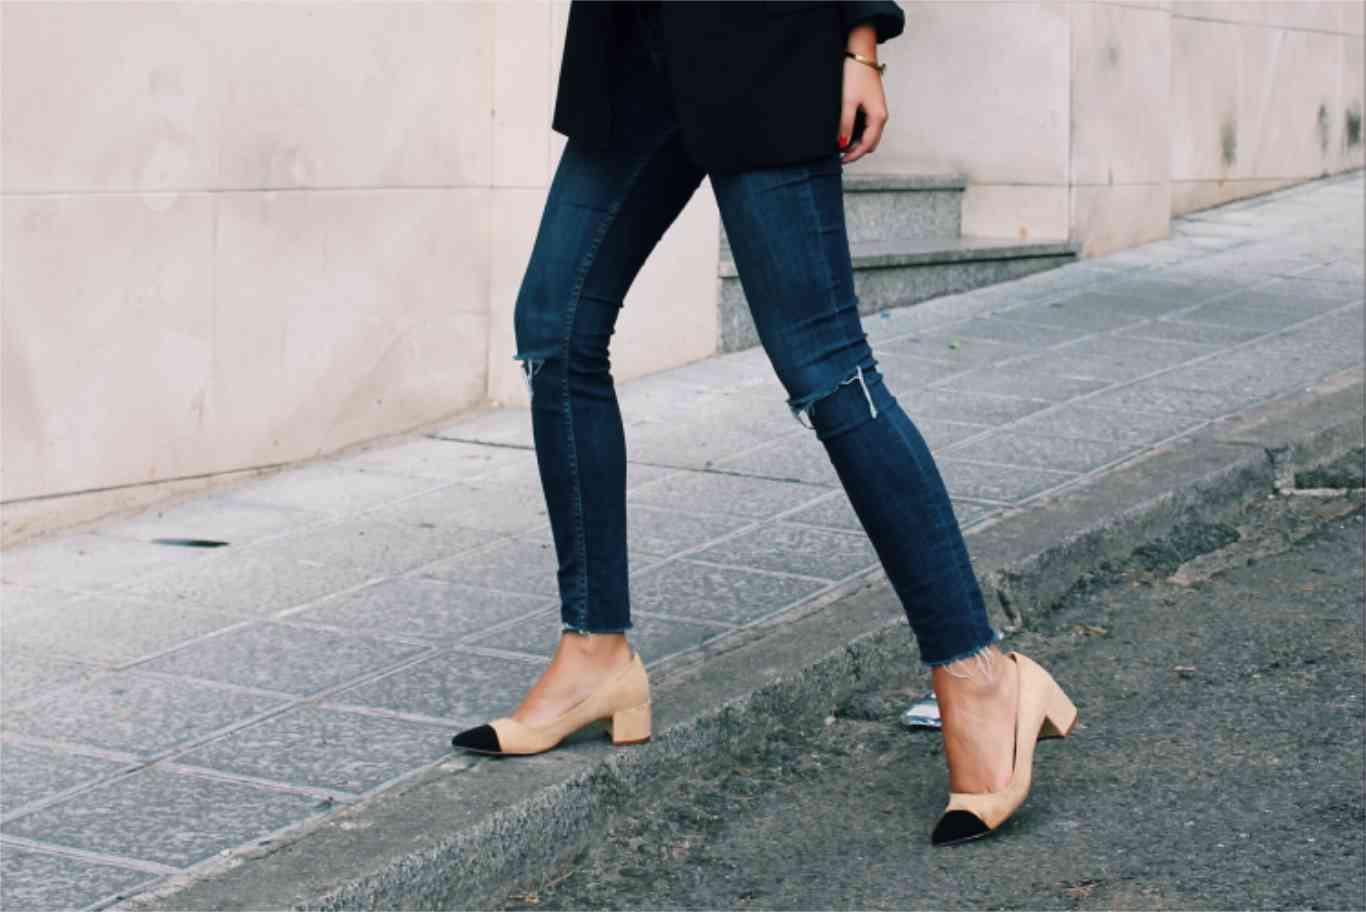 fffb4aa7 Zapatos 3 en 1. ¡Gracias Zara! - Dream Alcalá